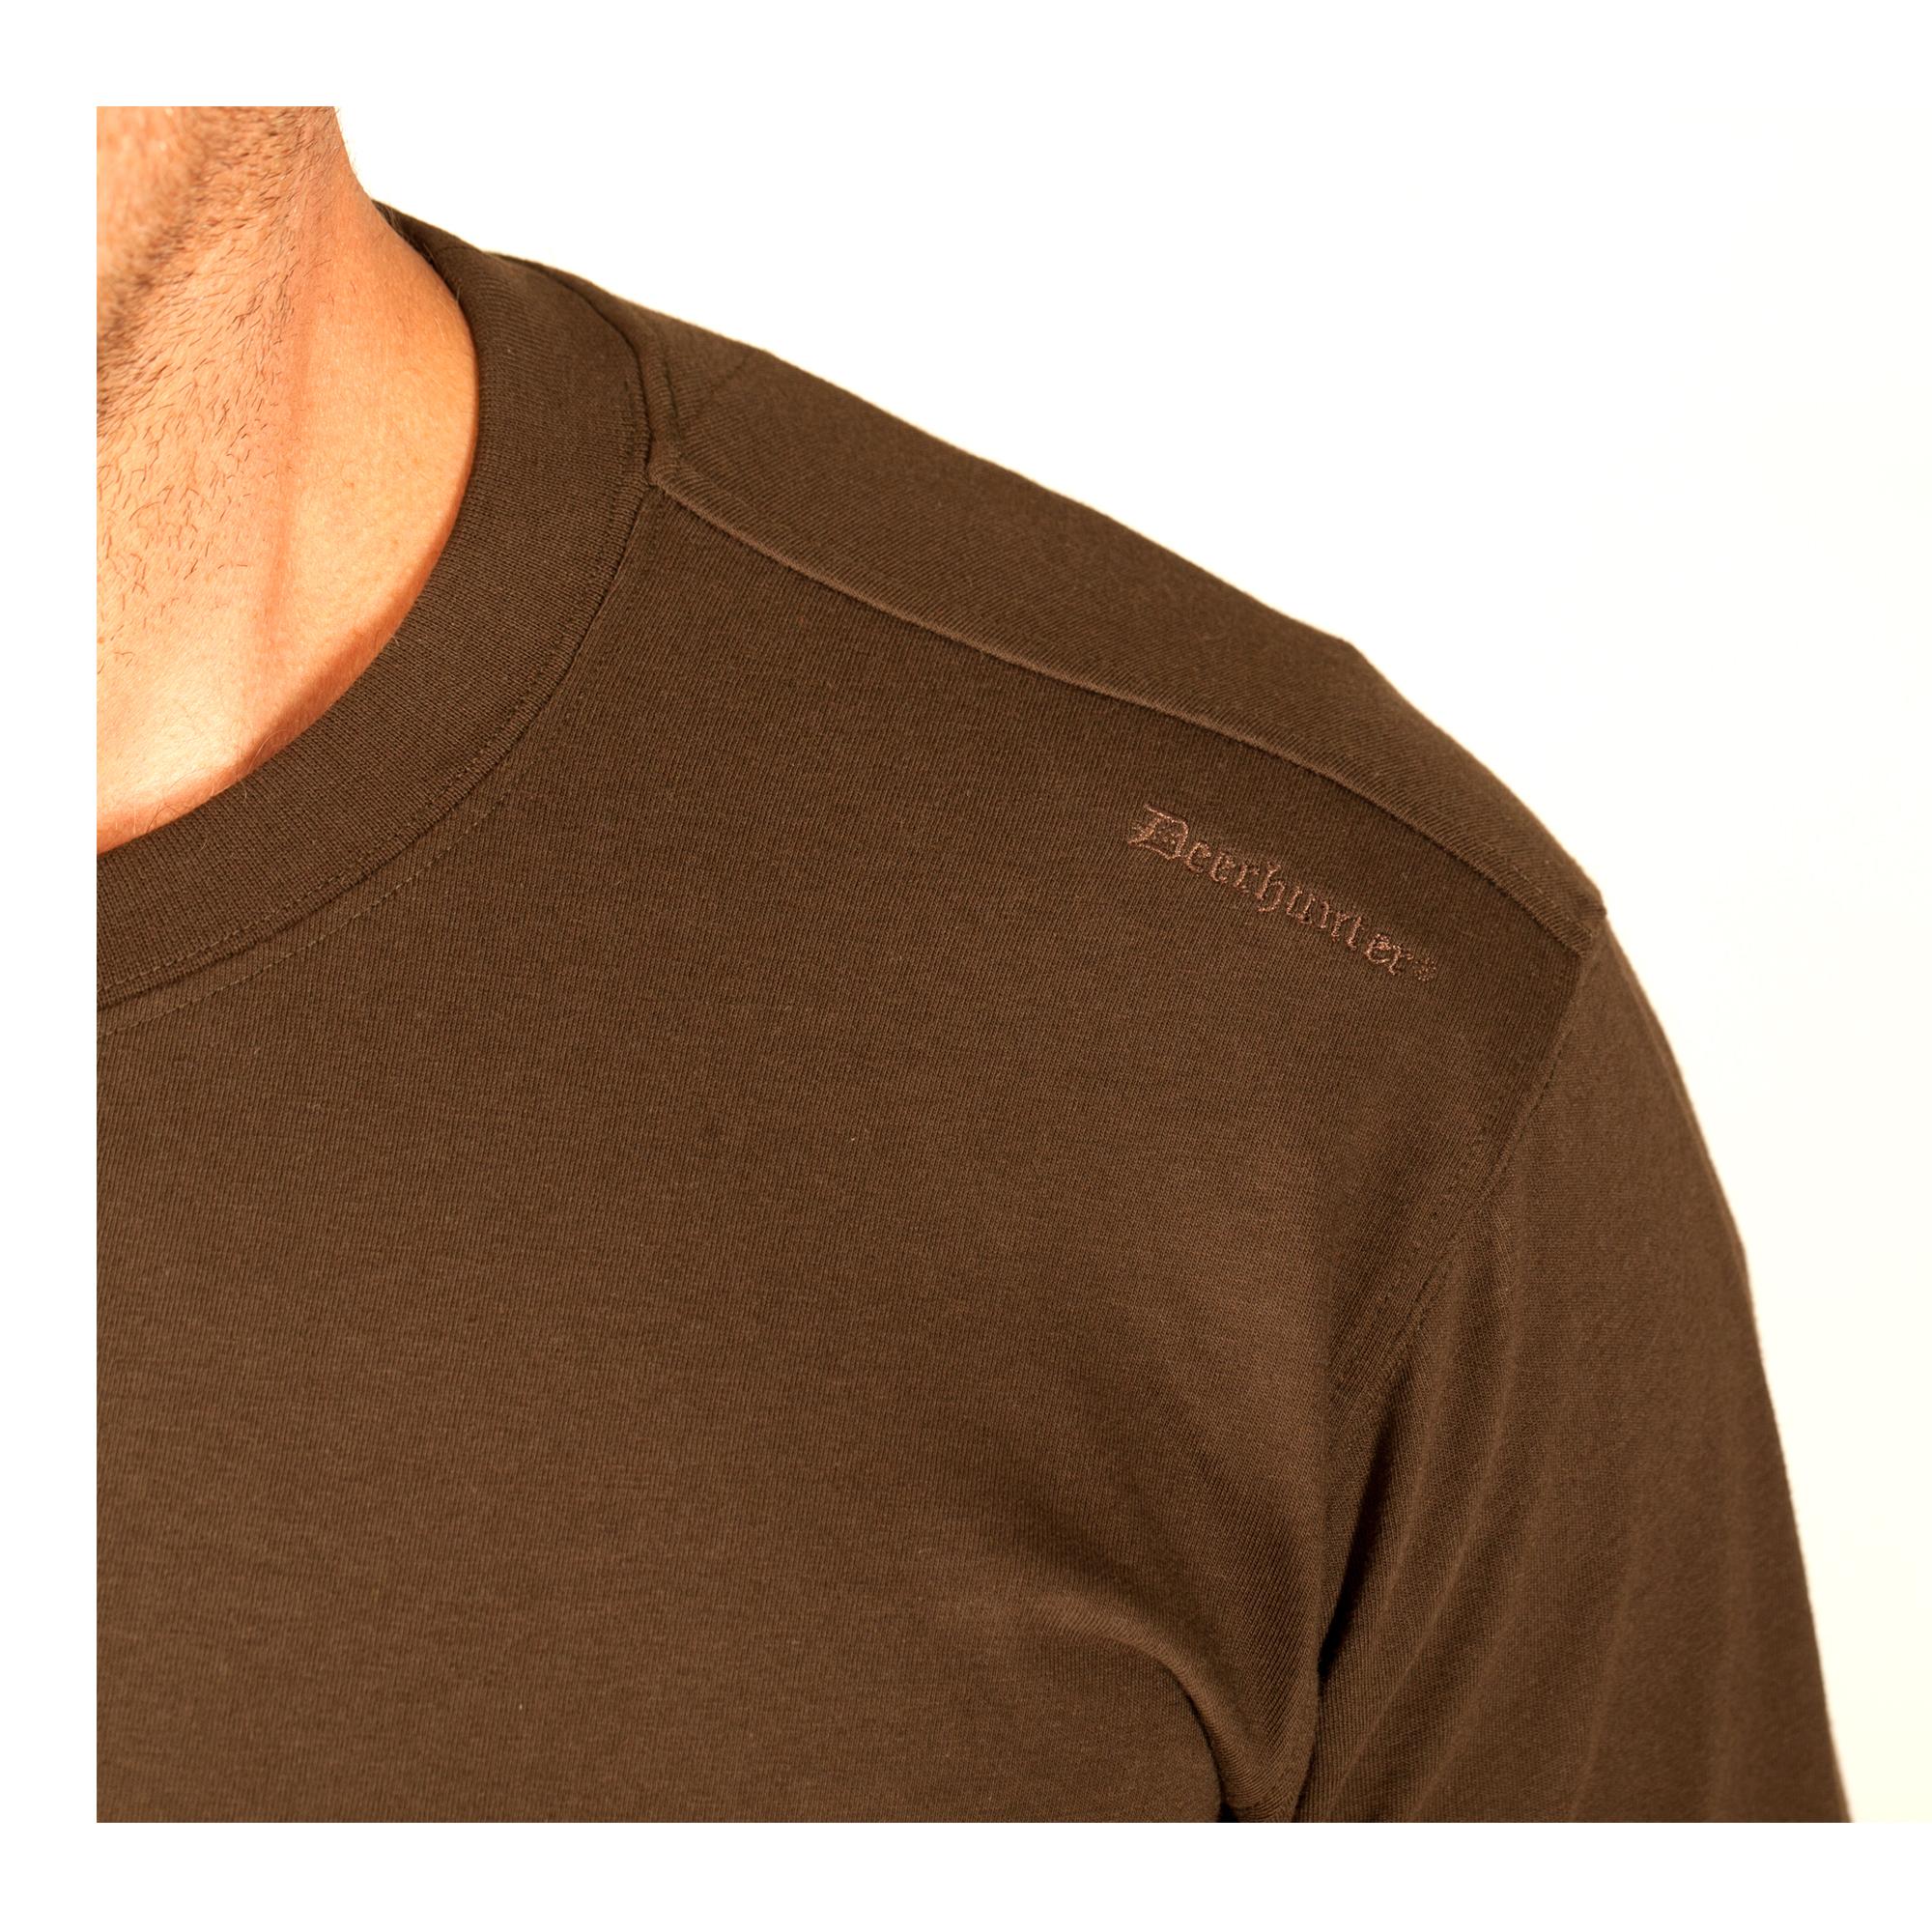 NEU Tactical QUICK DRY Poloshirt 1//1 ARM Polohemd langarm Bluse UBAC S-3XL